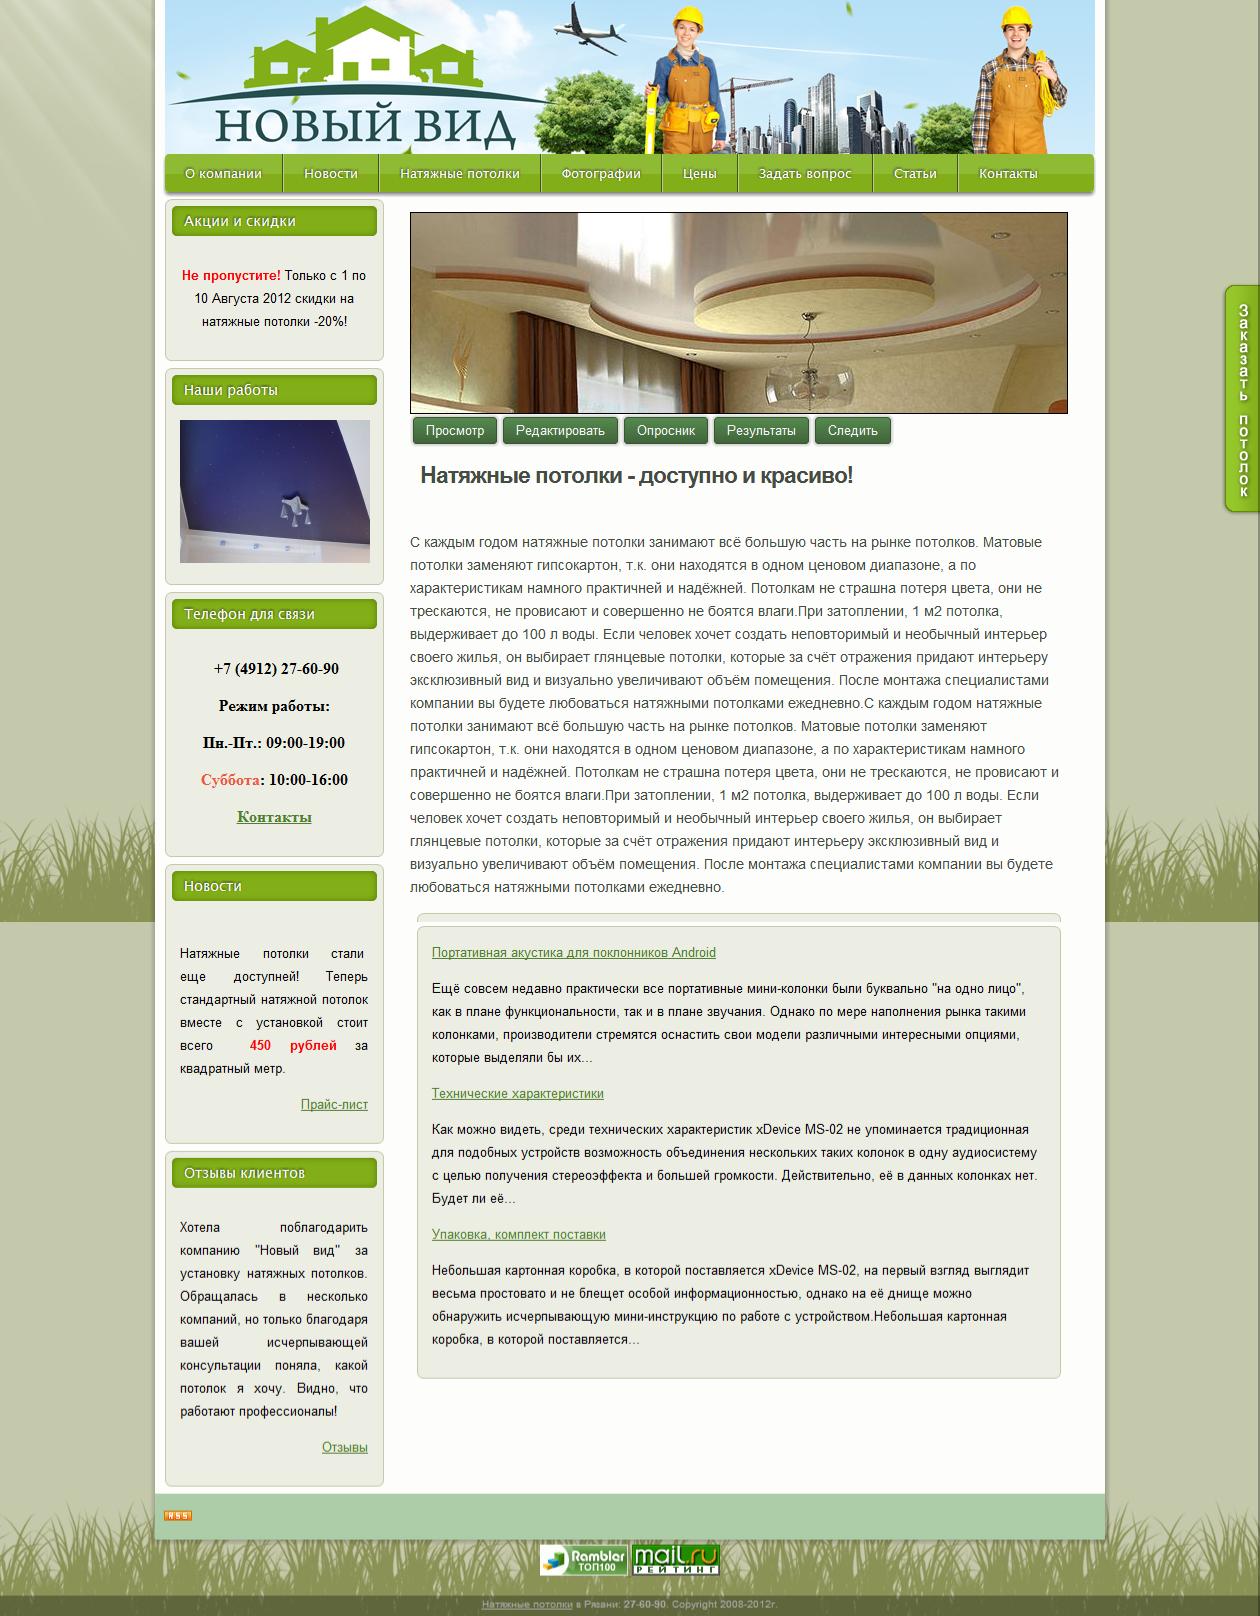 Редизайн верстка и интеграция на систему управления Drupal